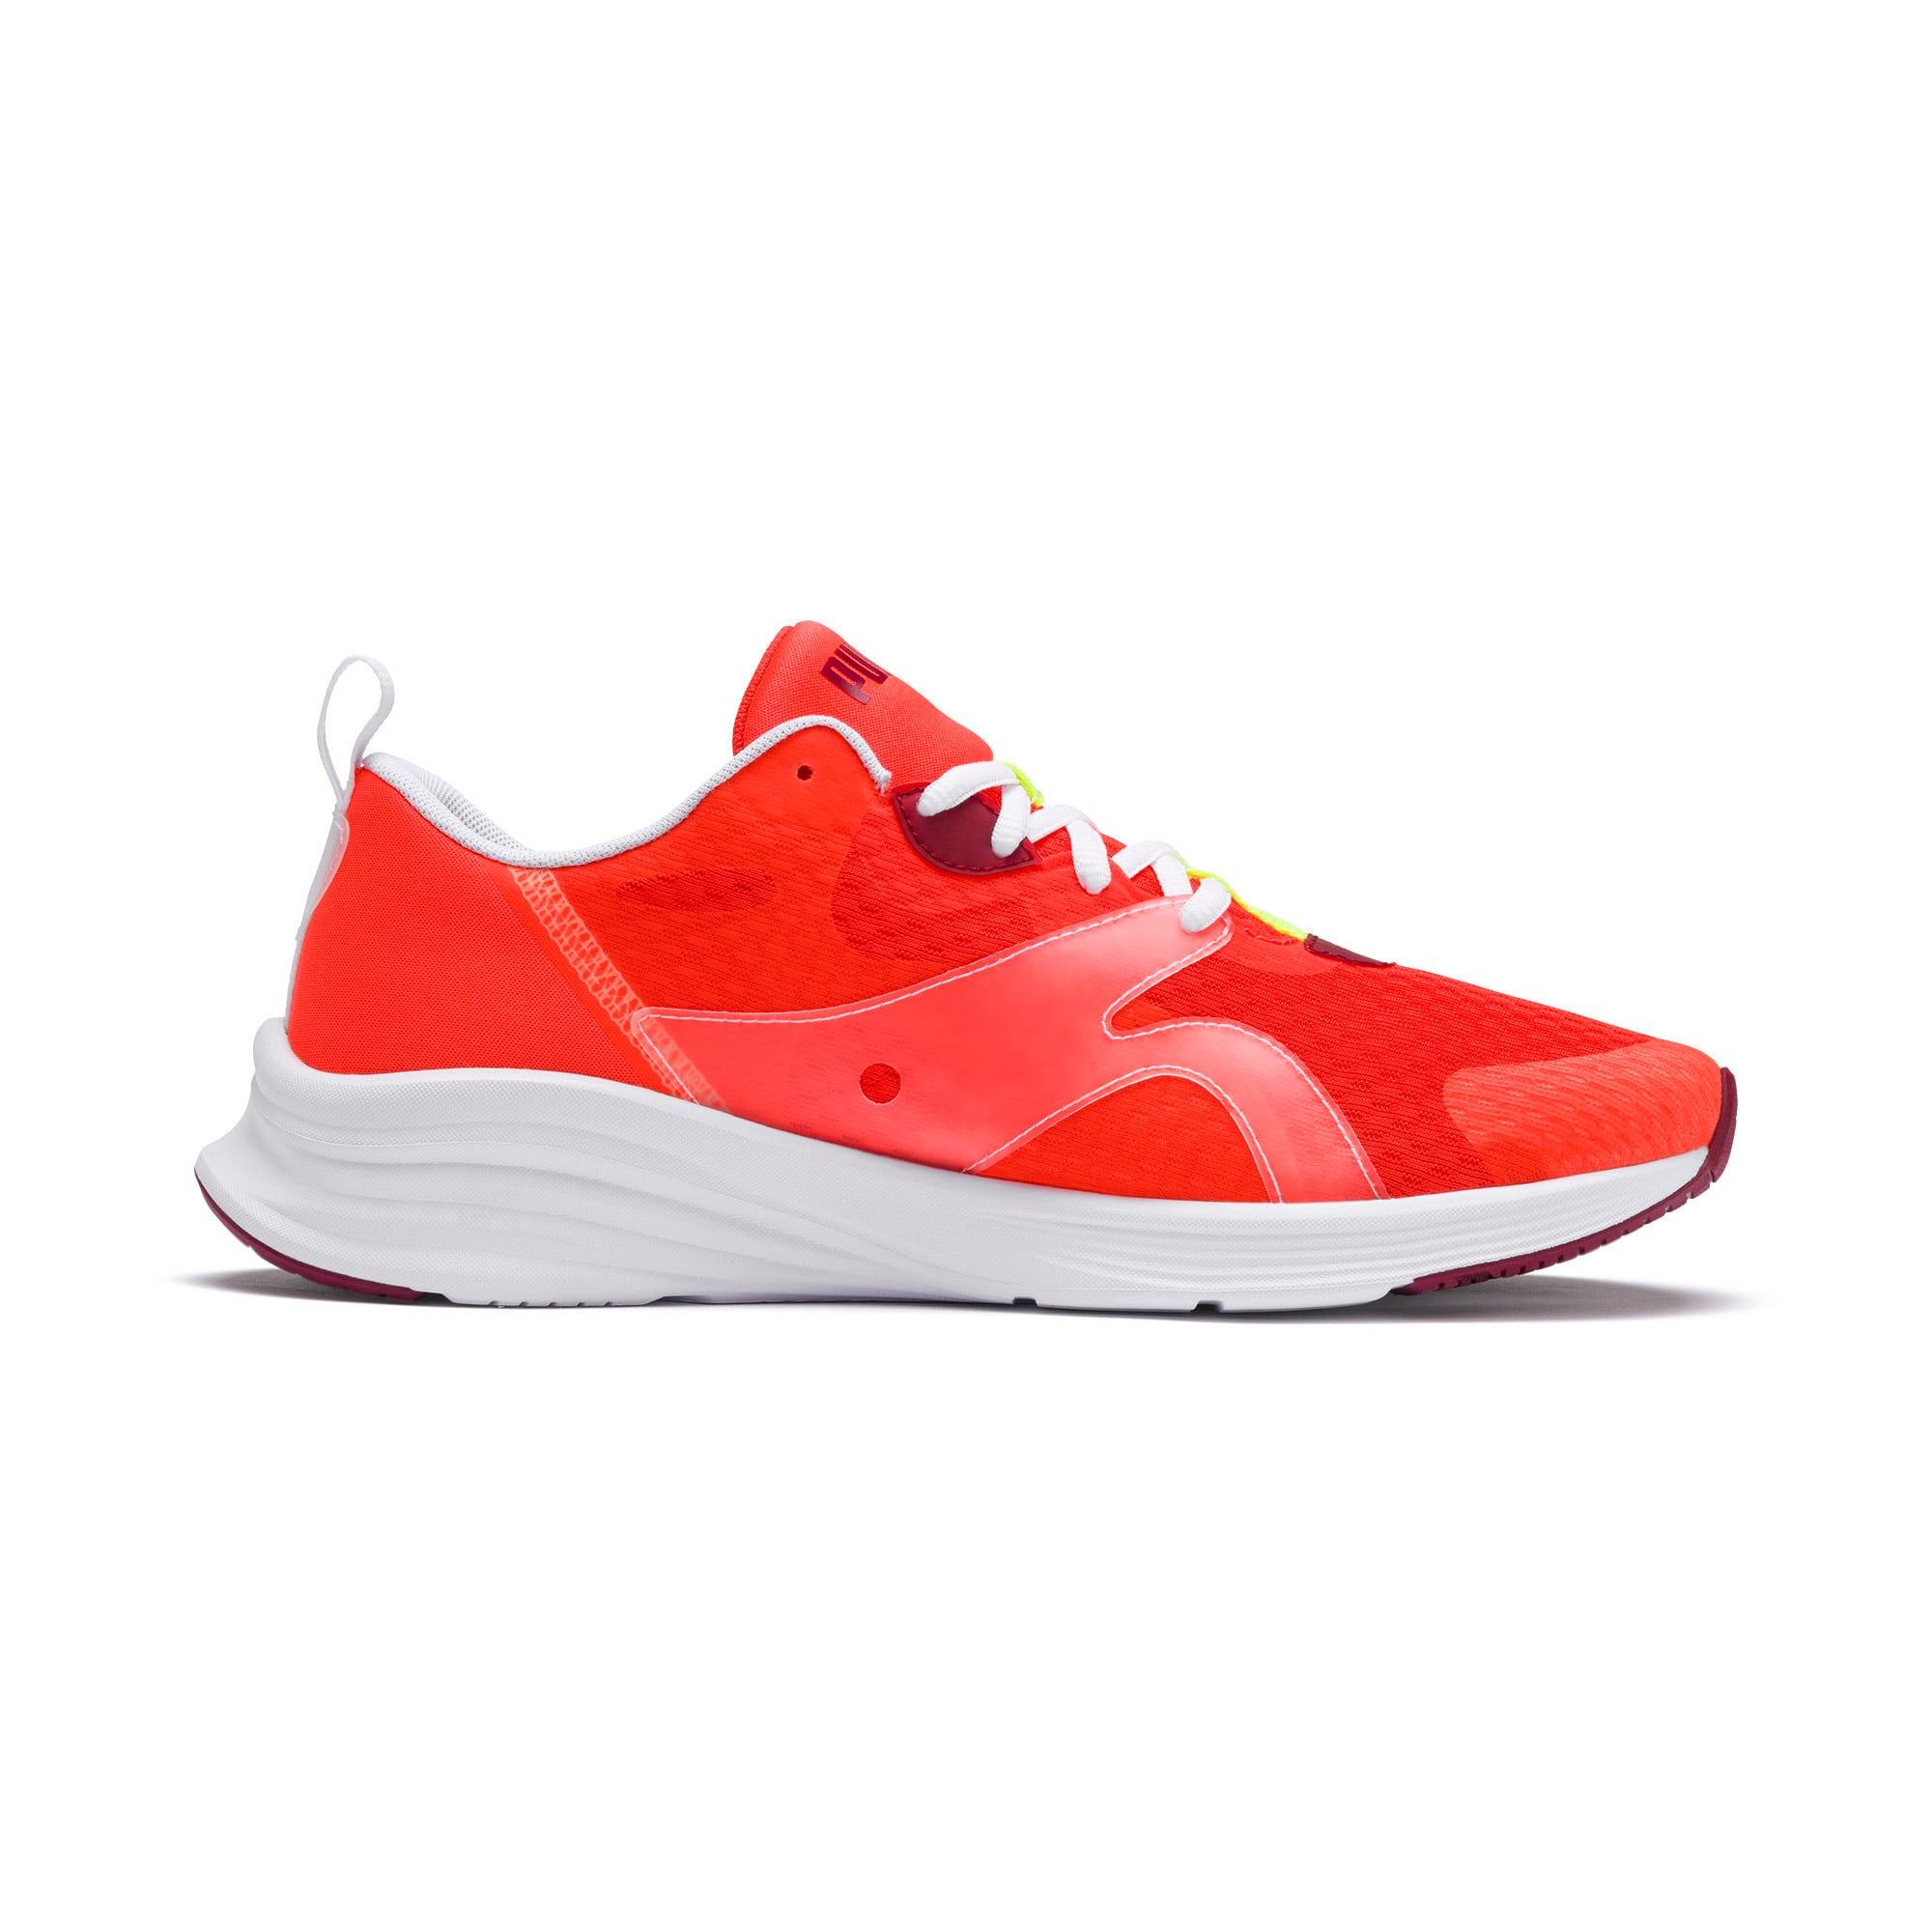 Thumbnail 5 of HYBRID Fuego Men's Running Shoes, Nrgy Red-Rhubarb, medium